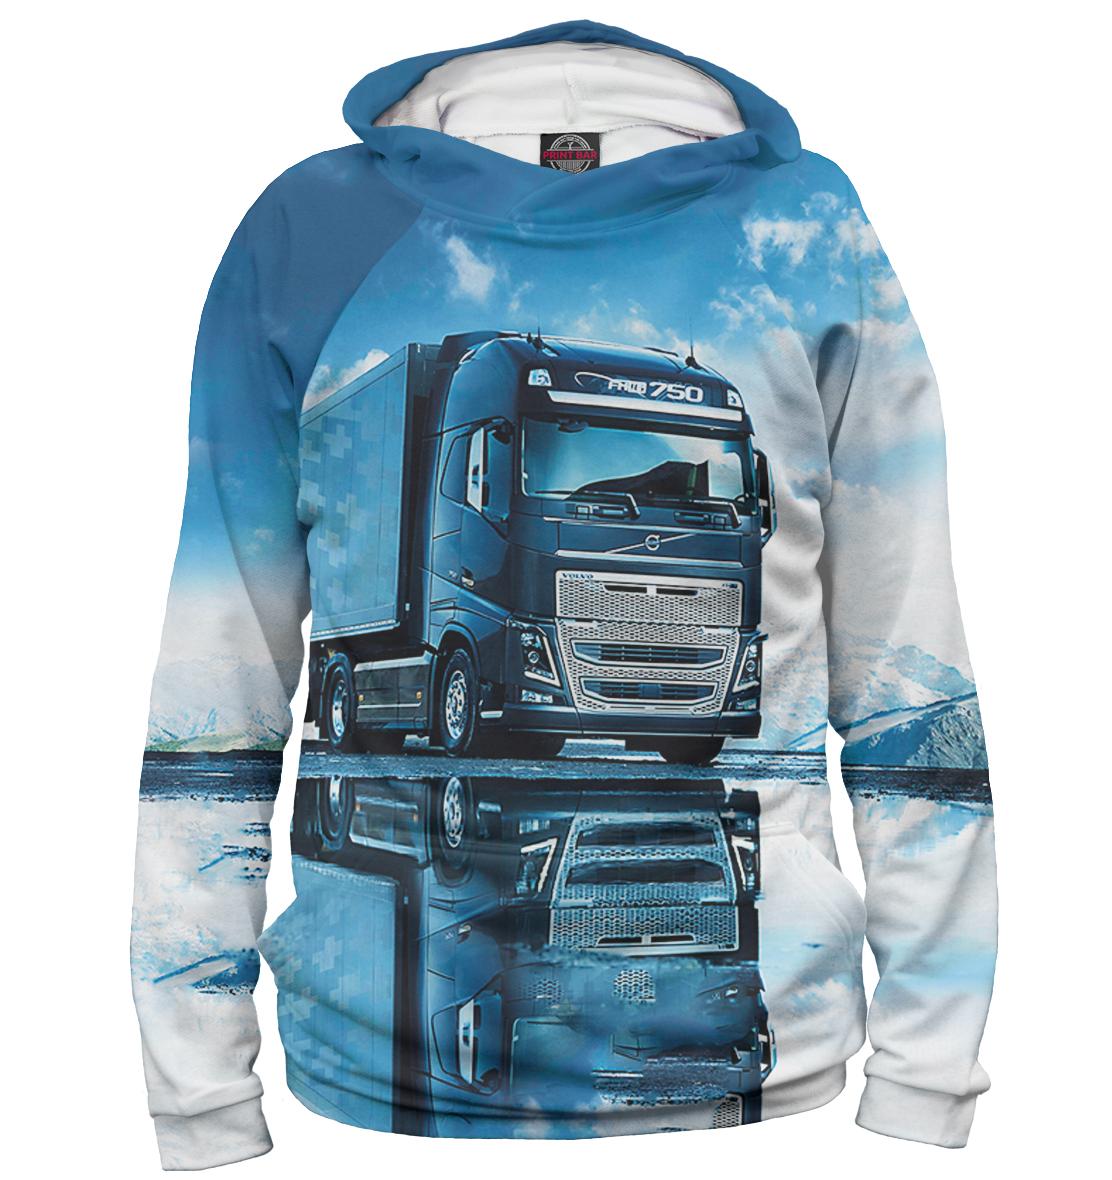 Купить Volvo, Printbar, Худи, GRZ-866702-hud-1